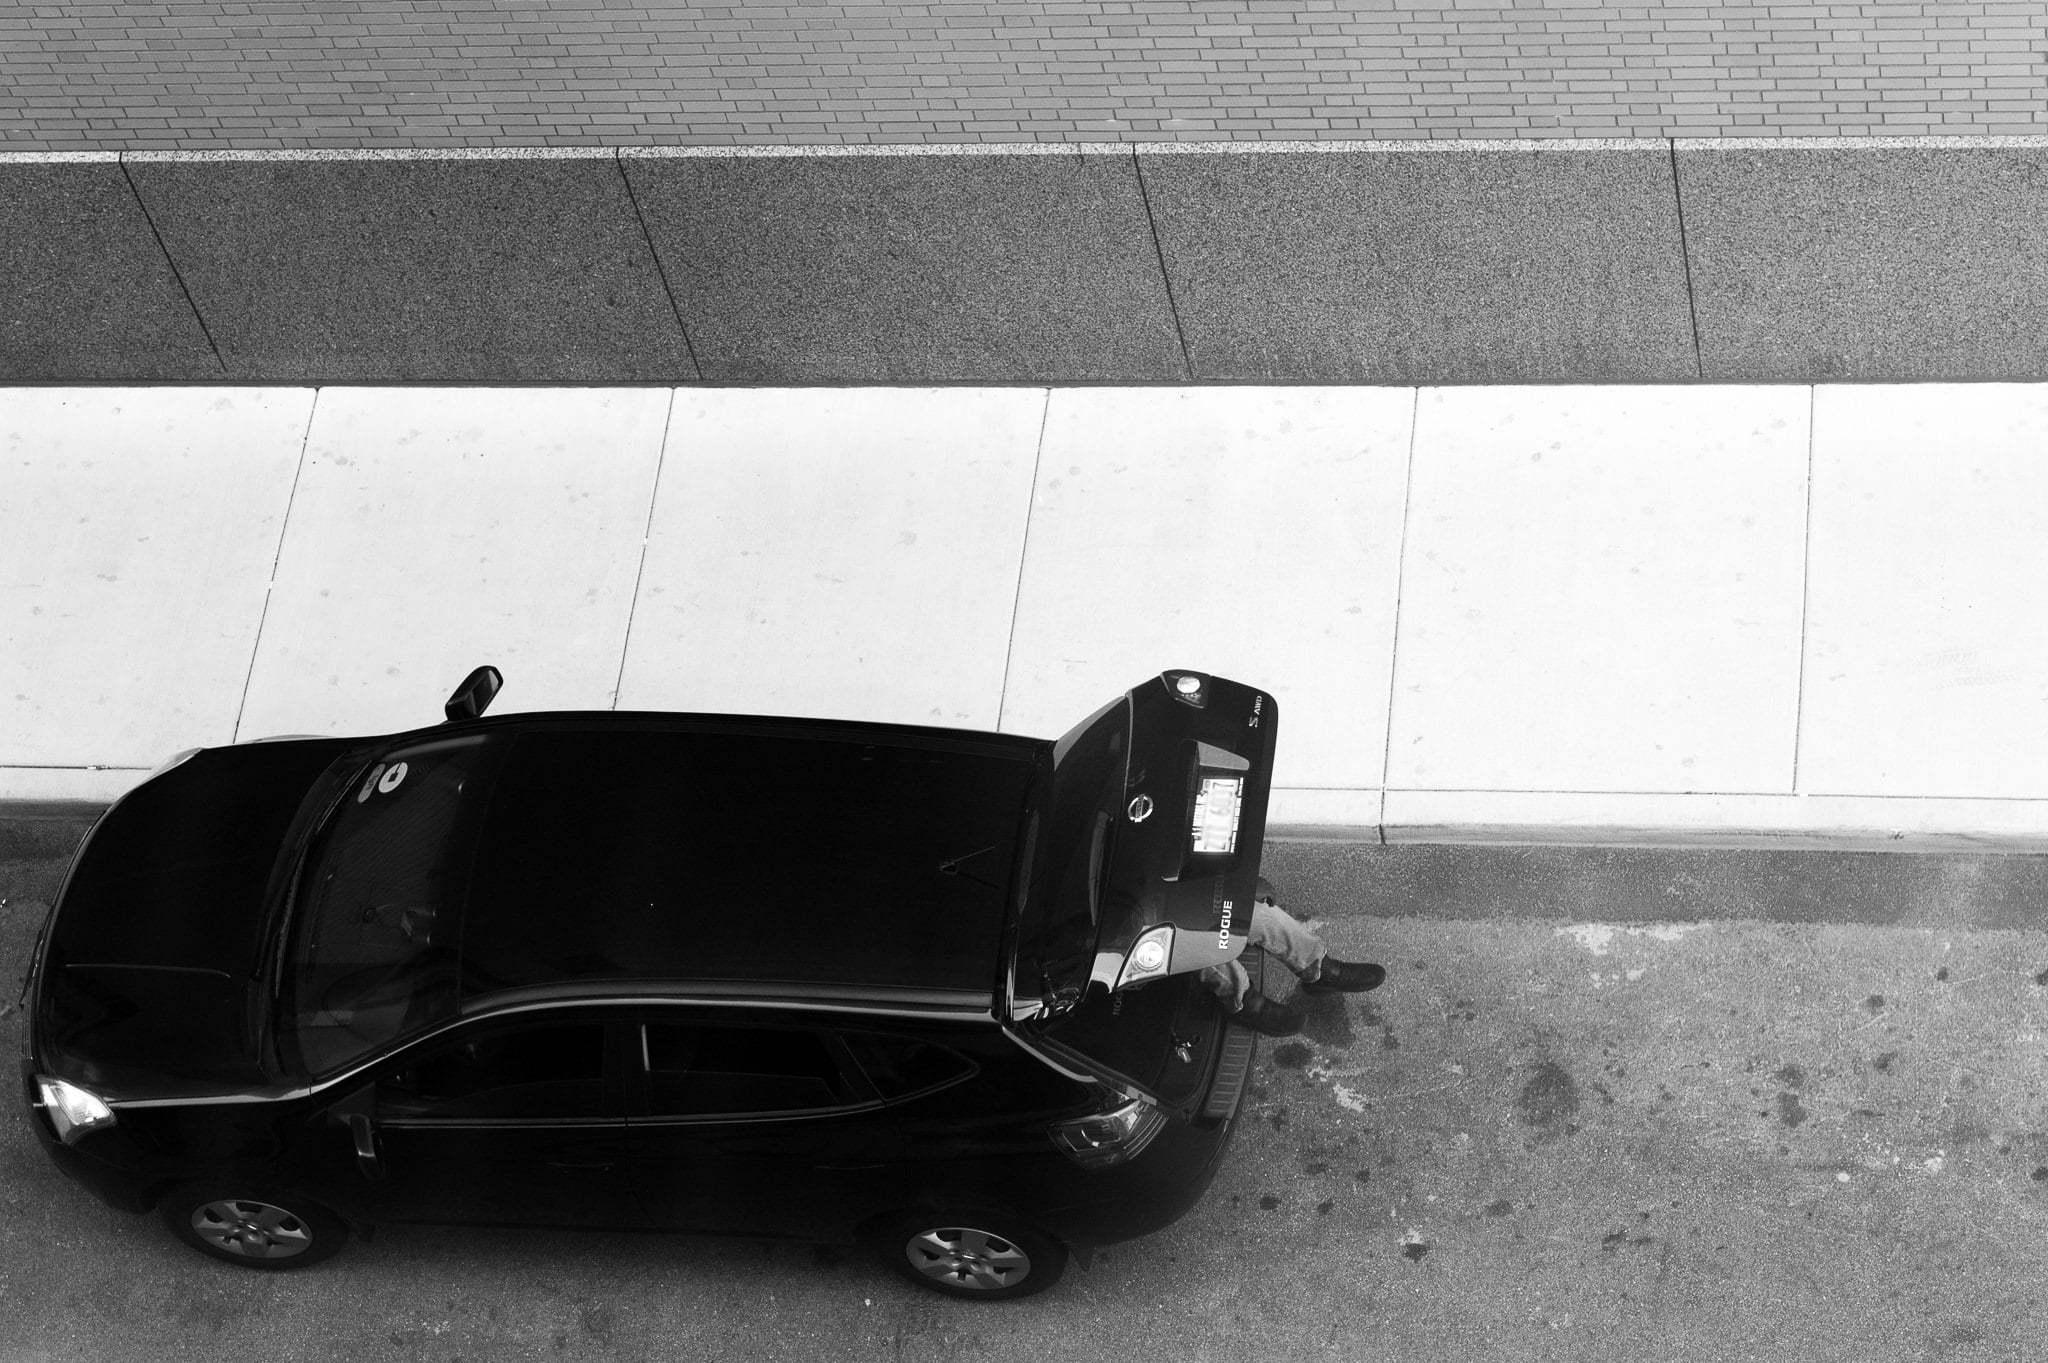 Street Photography Myths – Angles